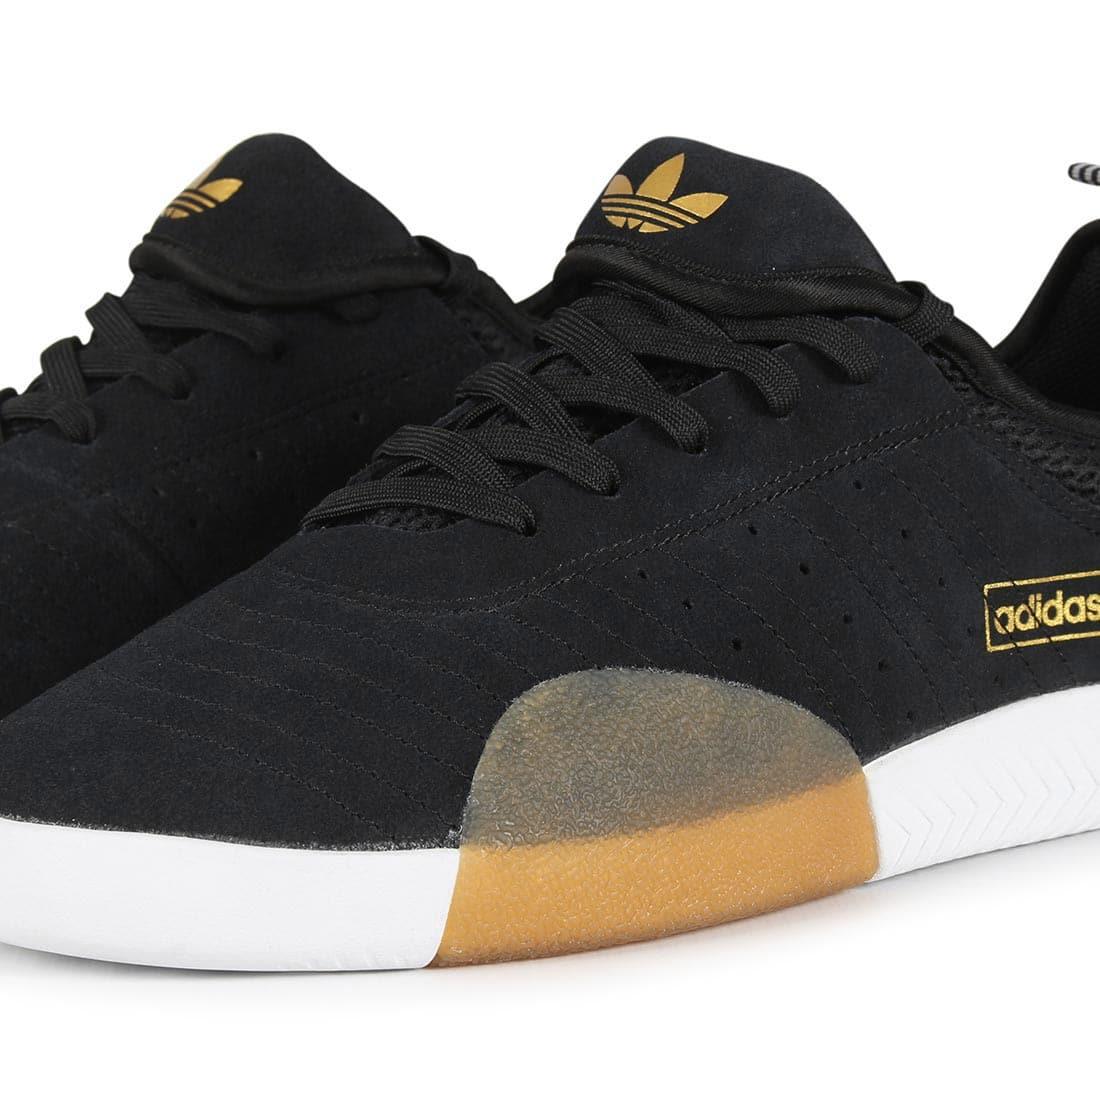 on sale fef60 e1f7b ... Adidas-3ST.003-Shoes-Core-Black-Light-Granite ...